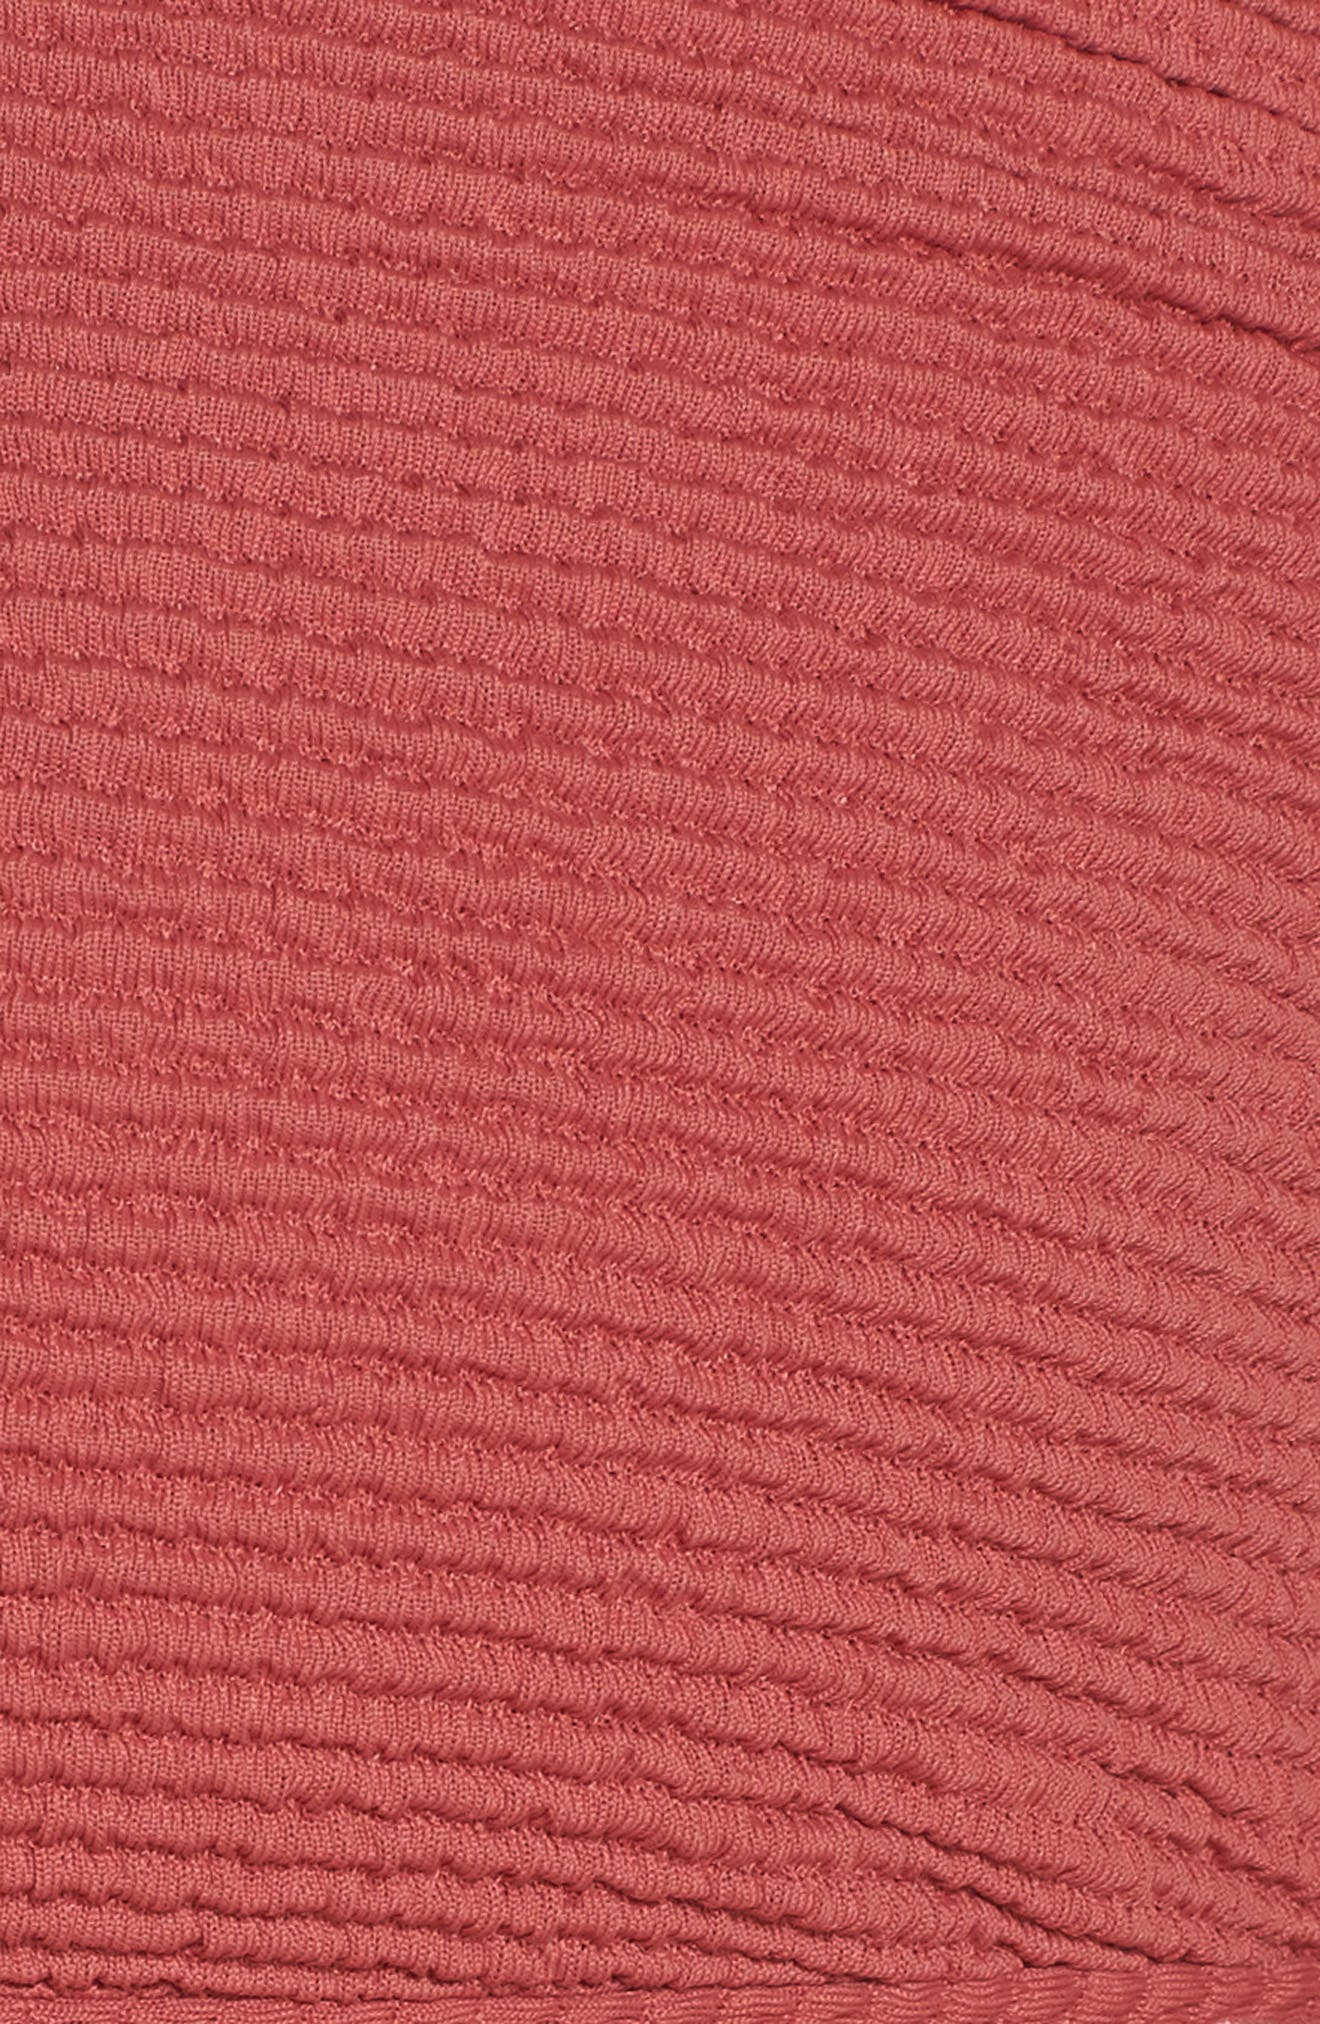 Malibu Bikini Top,                             Alternate thumbnail 5, color,                             RED MINERAL